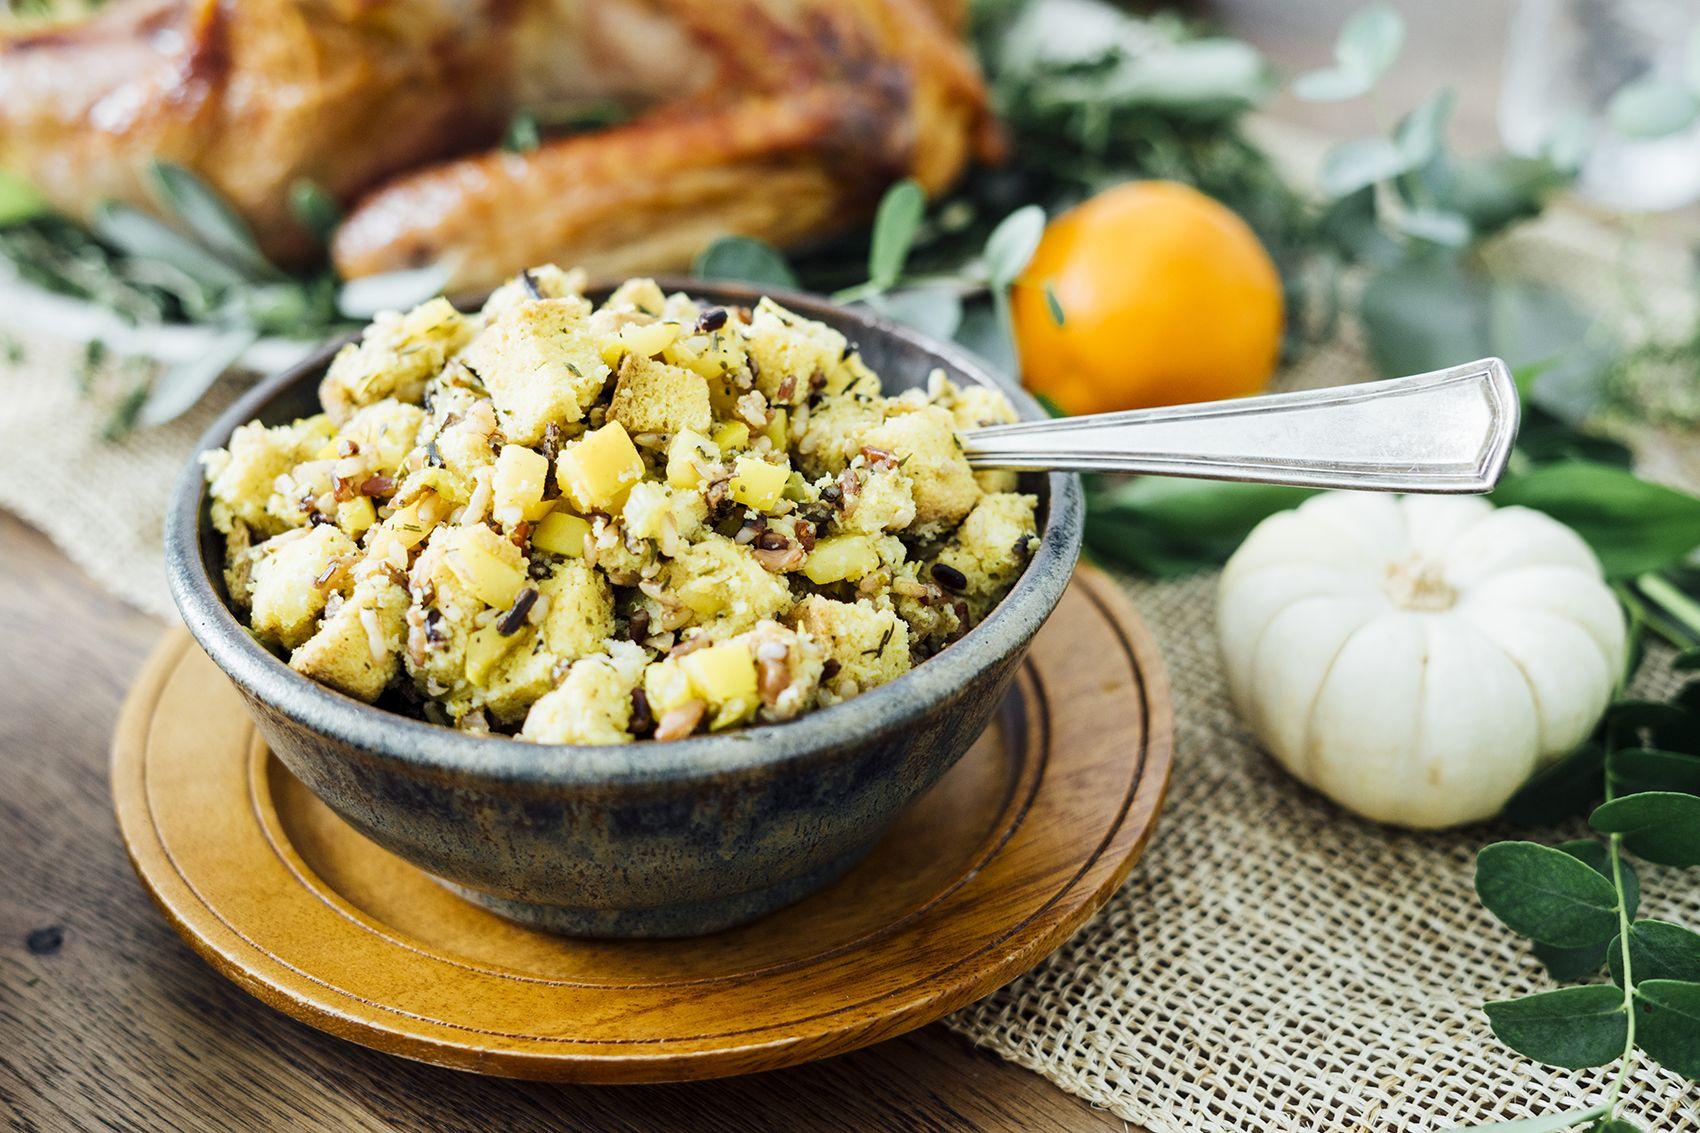 Thanksgiving Turkey, Sides and Pies Kimberton Whole